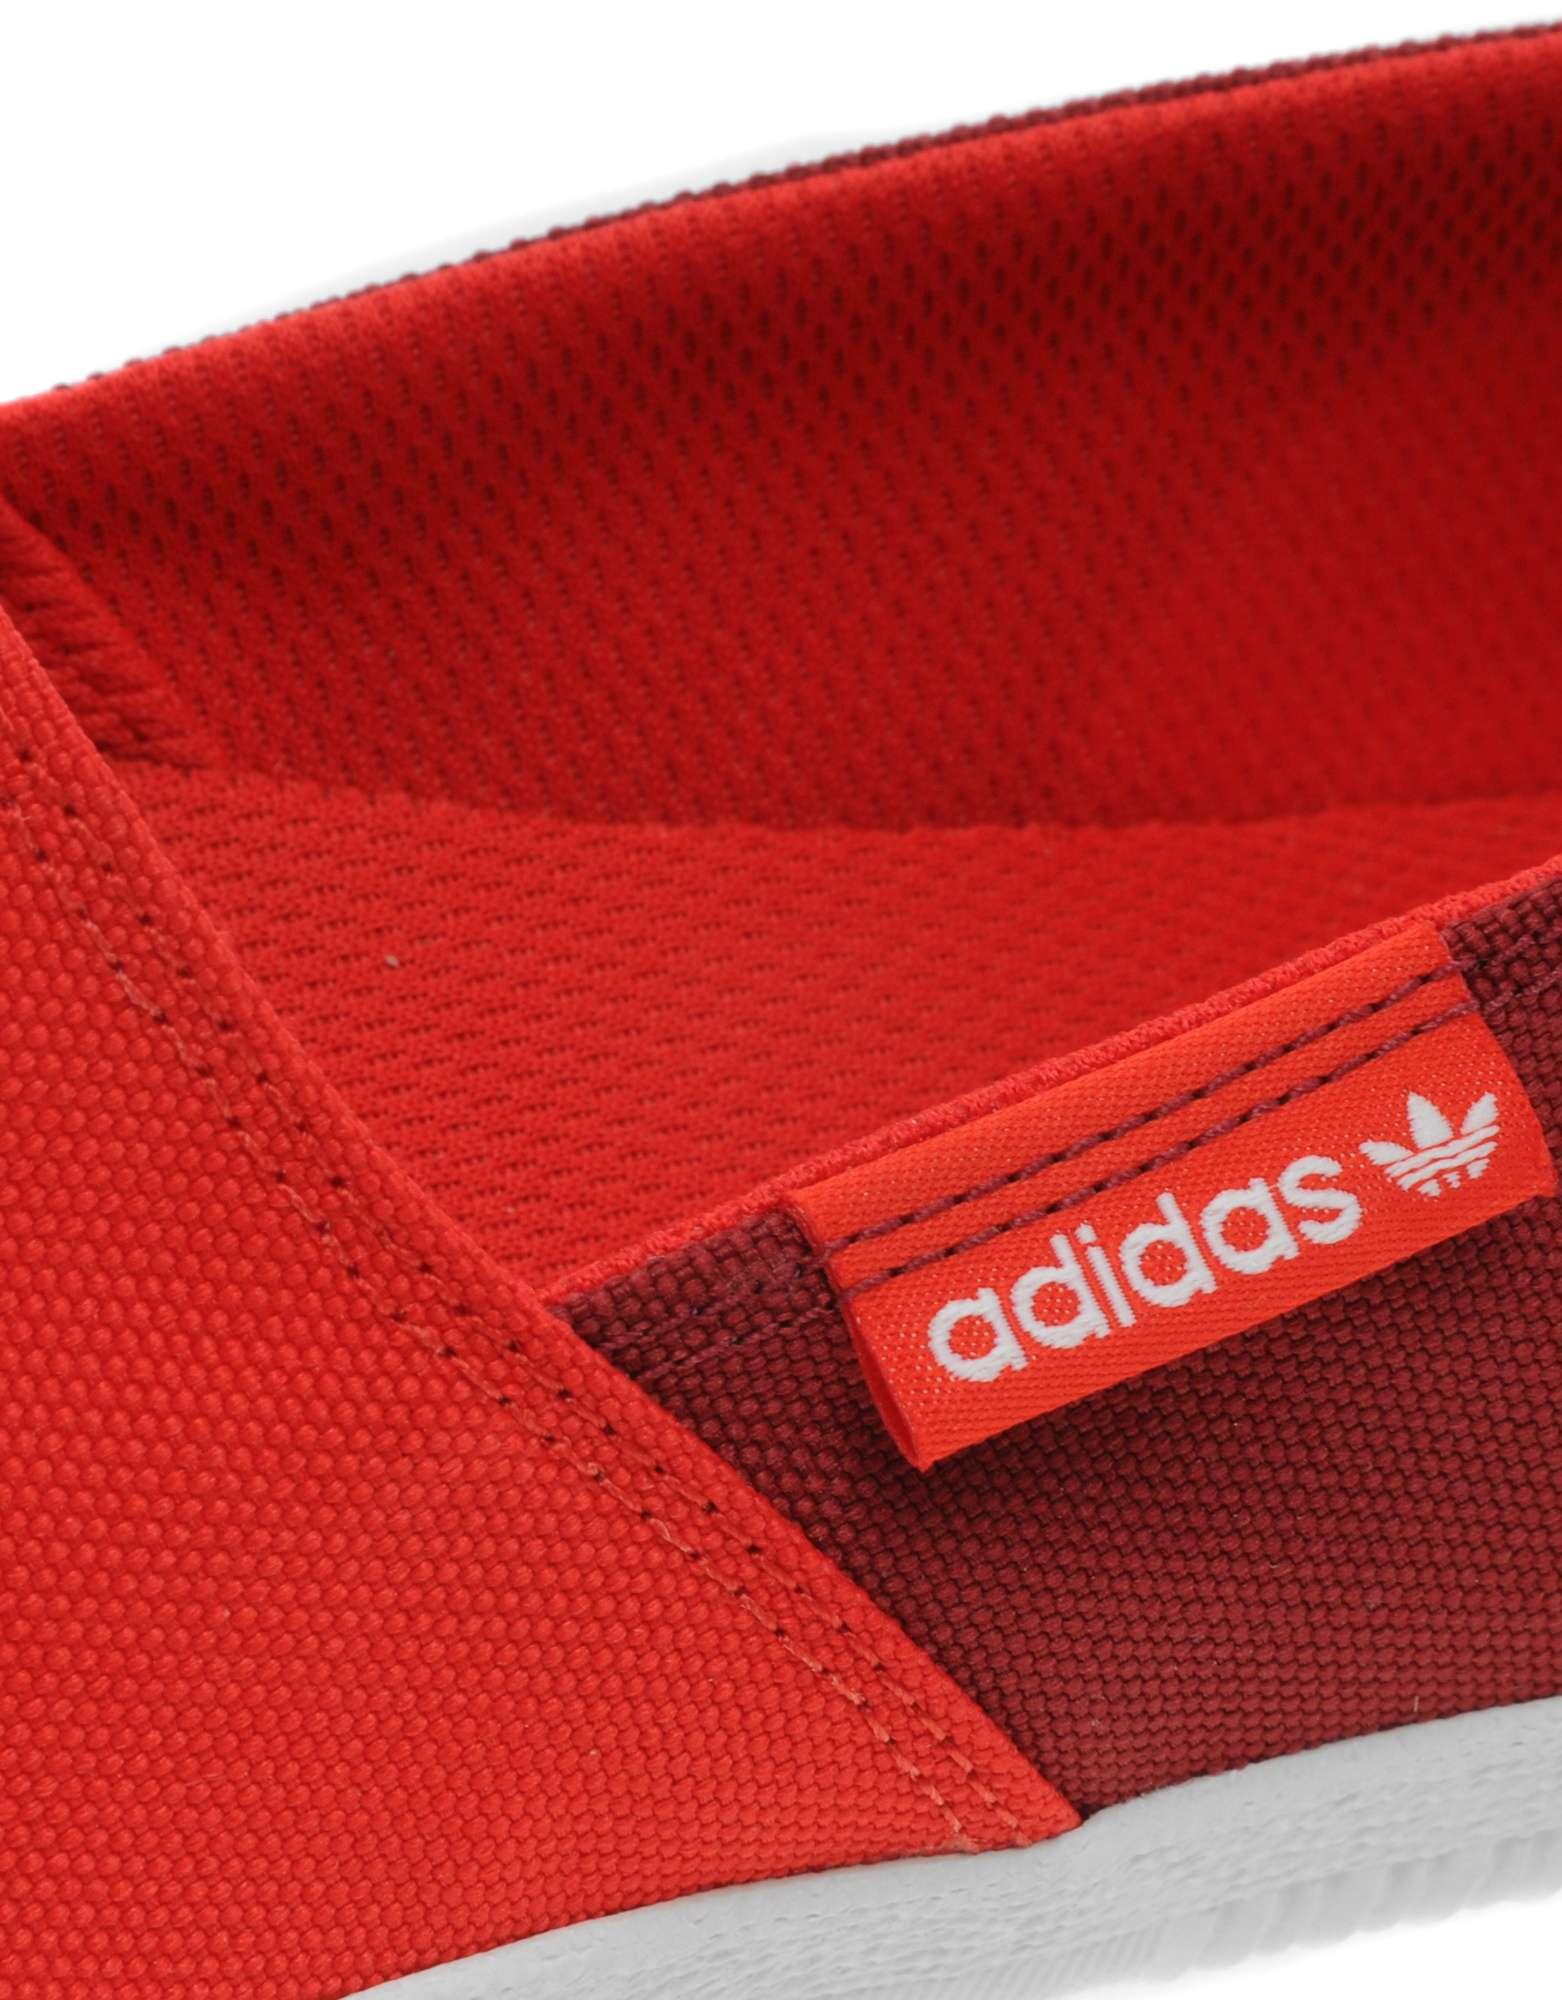 adidas Originals Adidrill